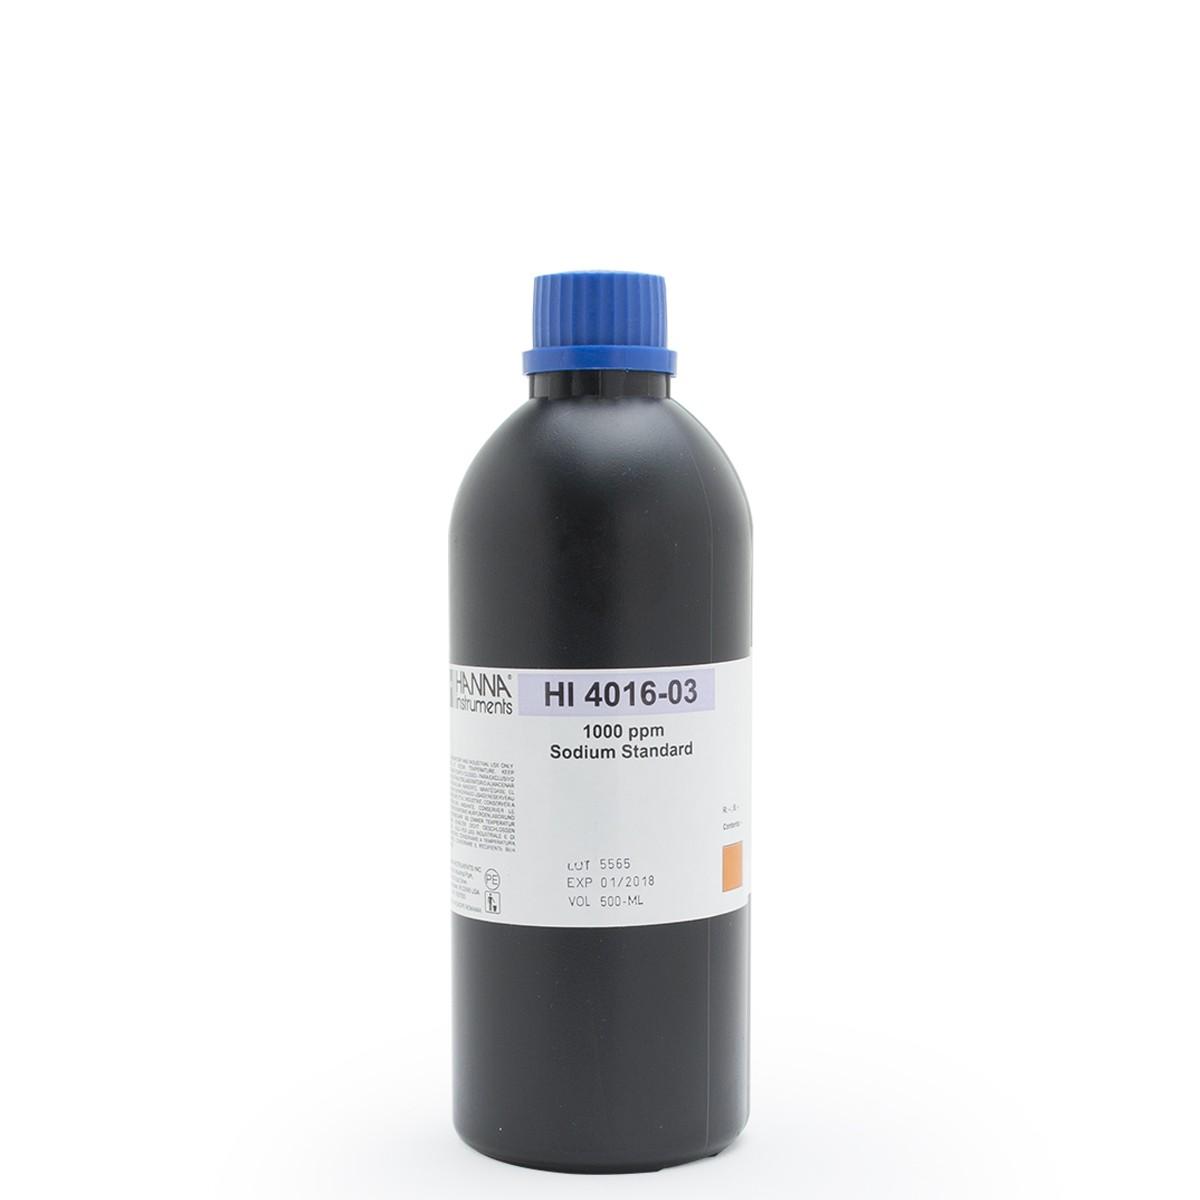 Sodium ISE 1000 ppm Standard - HI4016-03